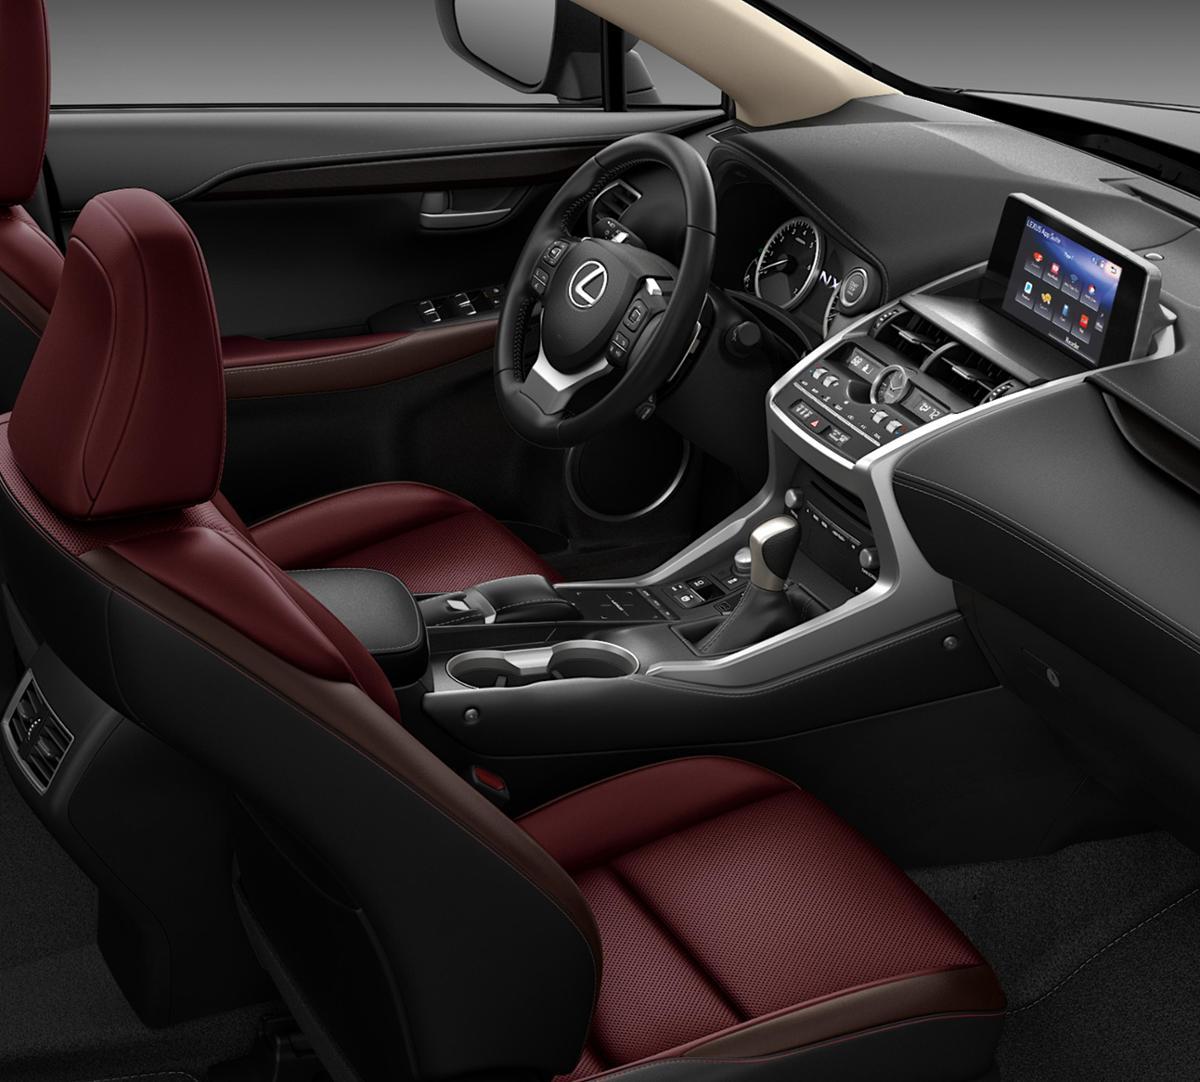 Larry H Miller Lexus >> 2019 Lexus NX 300 Eminent White Pearl Stock #45773 from Larry H. Miller Lexus of Lindon